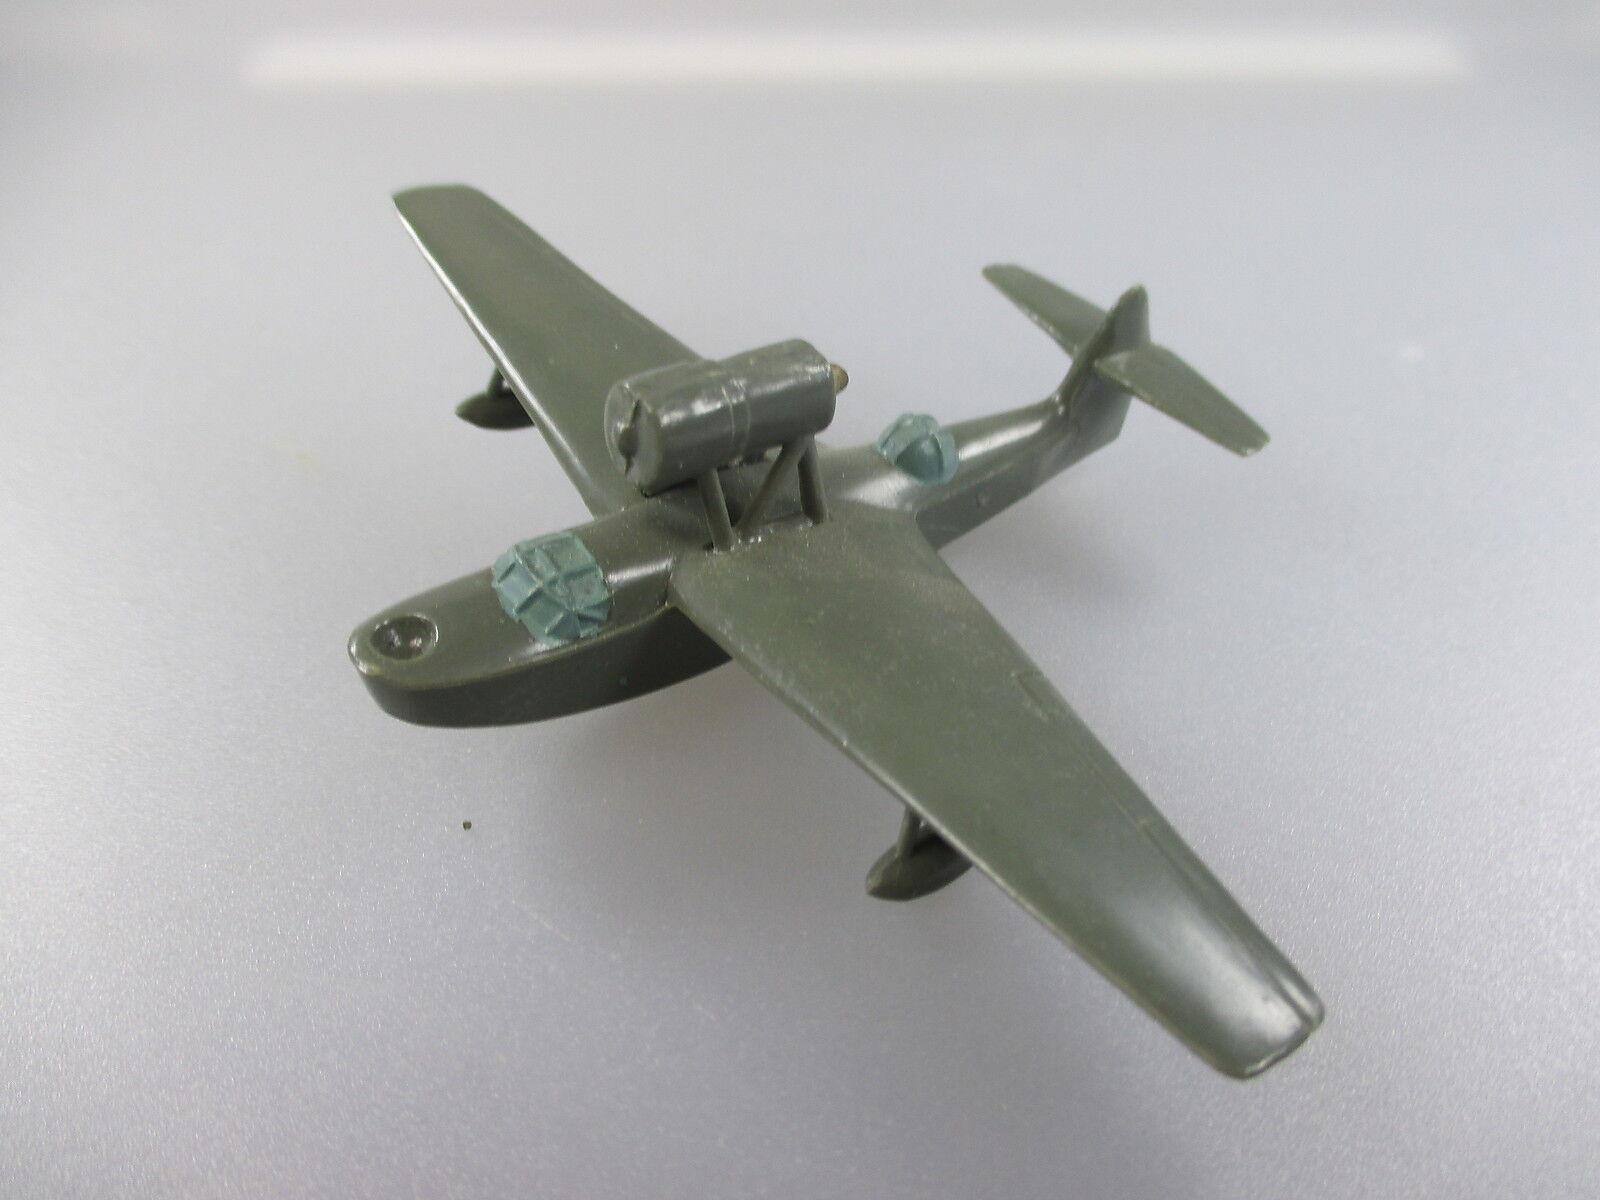 Wiking  avion r8 mbr-2 mbr-2 mbr-2 (fz1) 4c3620